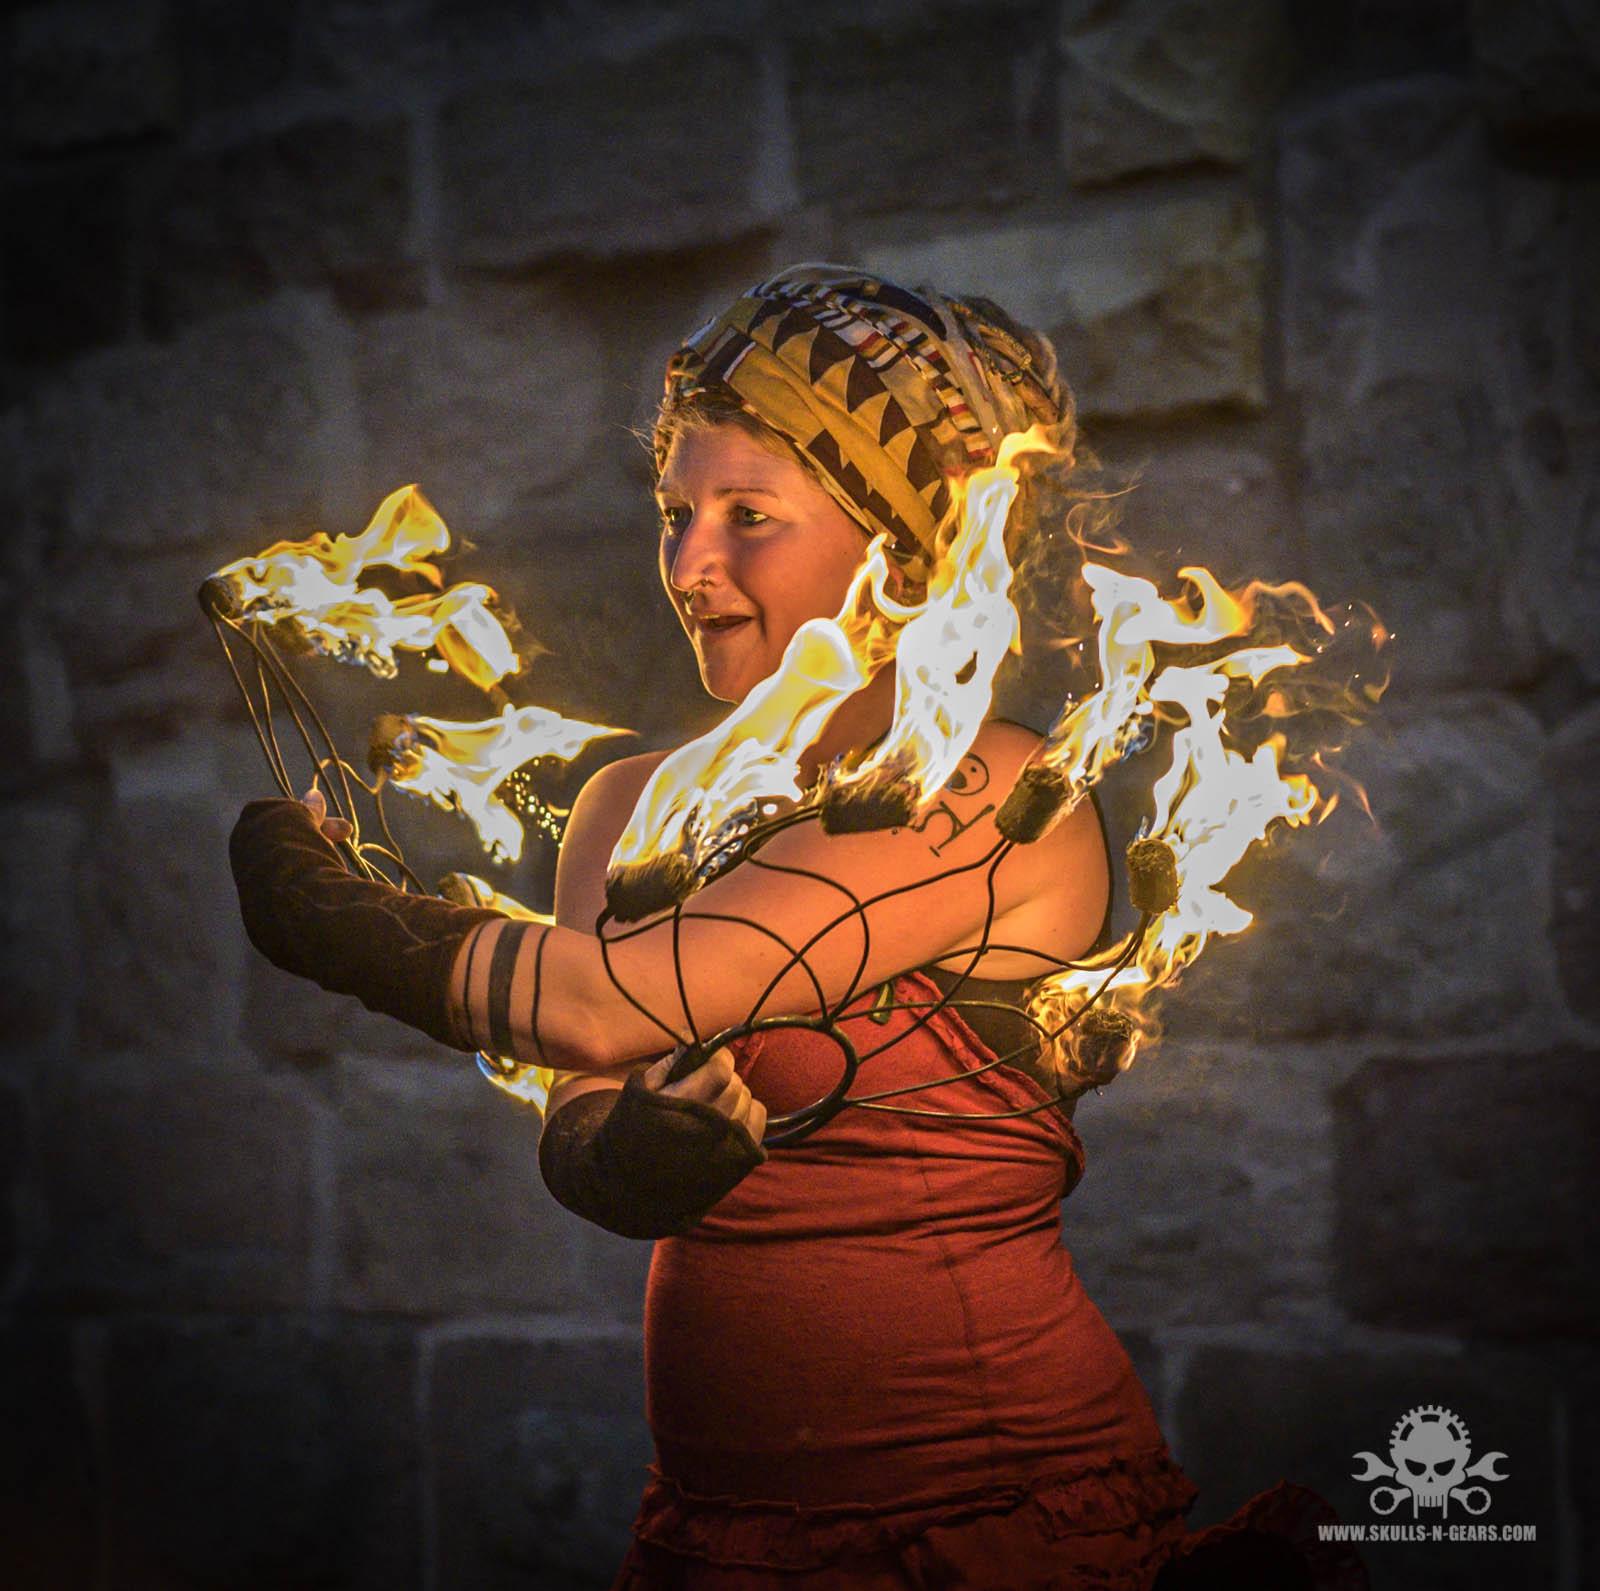 Feuertanz Festival 2019 - Feuershow-1208